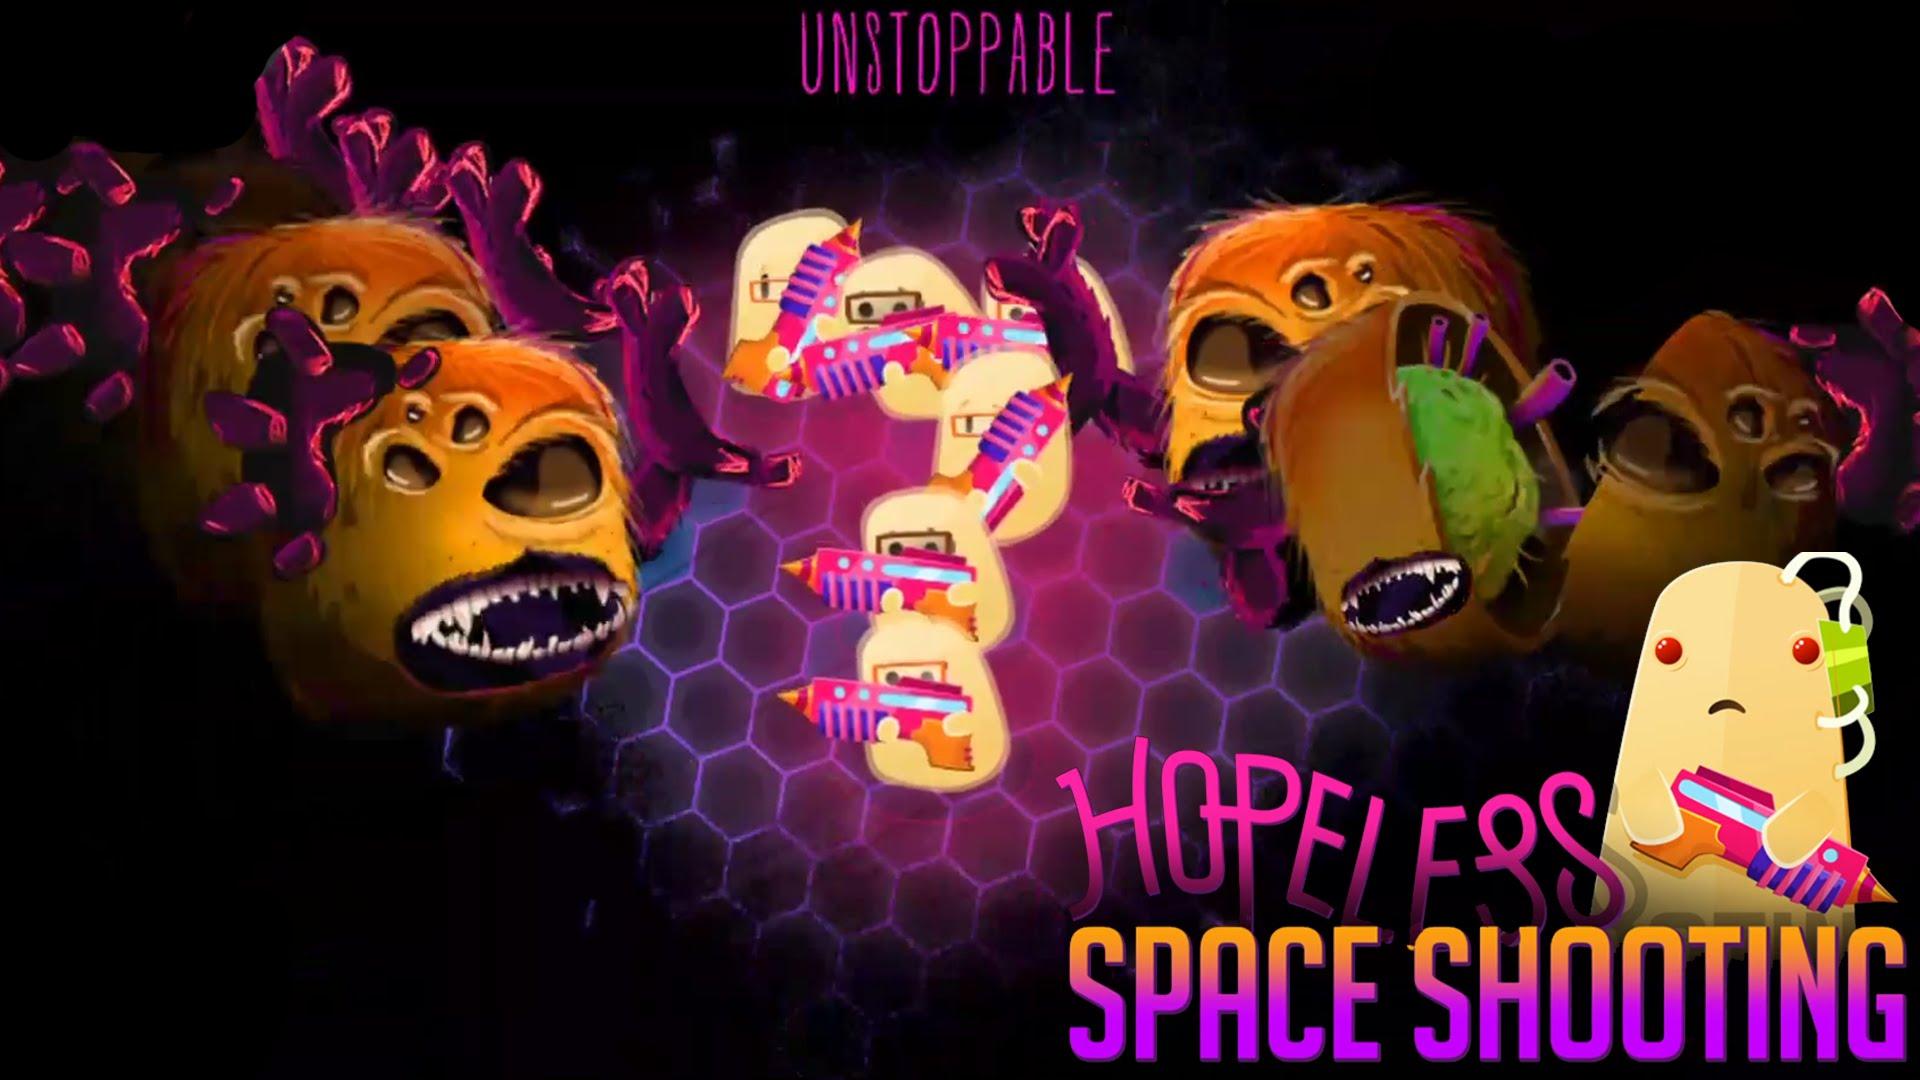 Análisis Juego Hopeless: Space Shooting